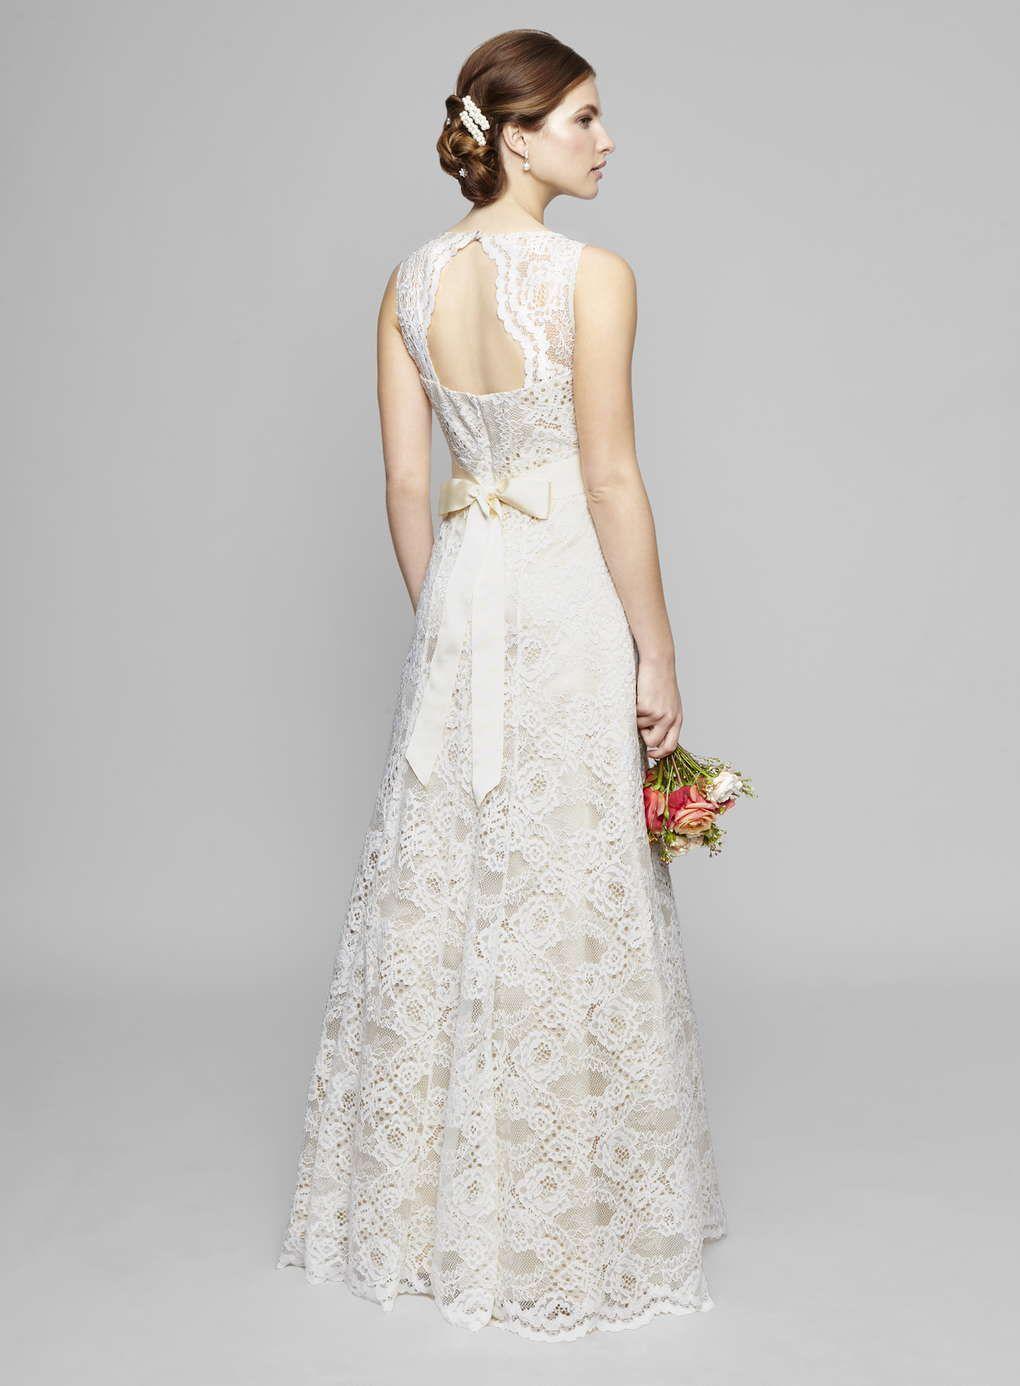 Ivory Bella Vintage Keyhole Wedding Dress Bhs Wedding Dresses High Street Wedding Dresses Best Wedding Dresses